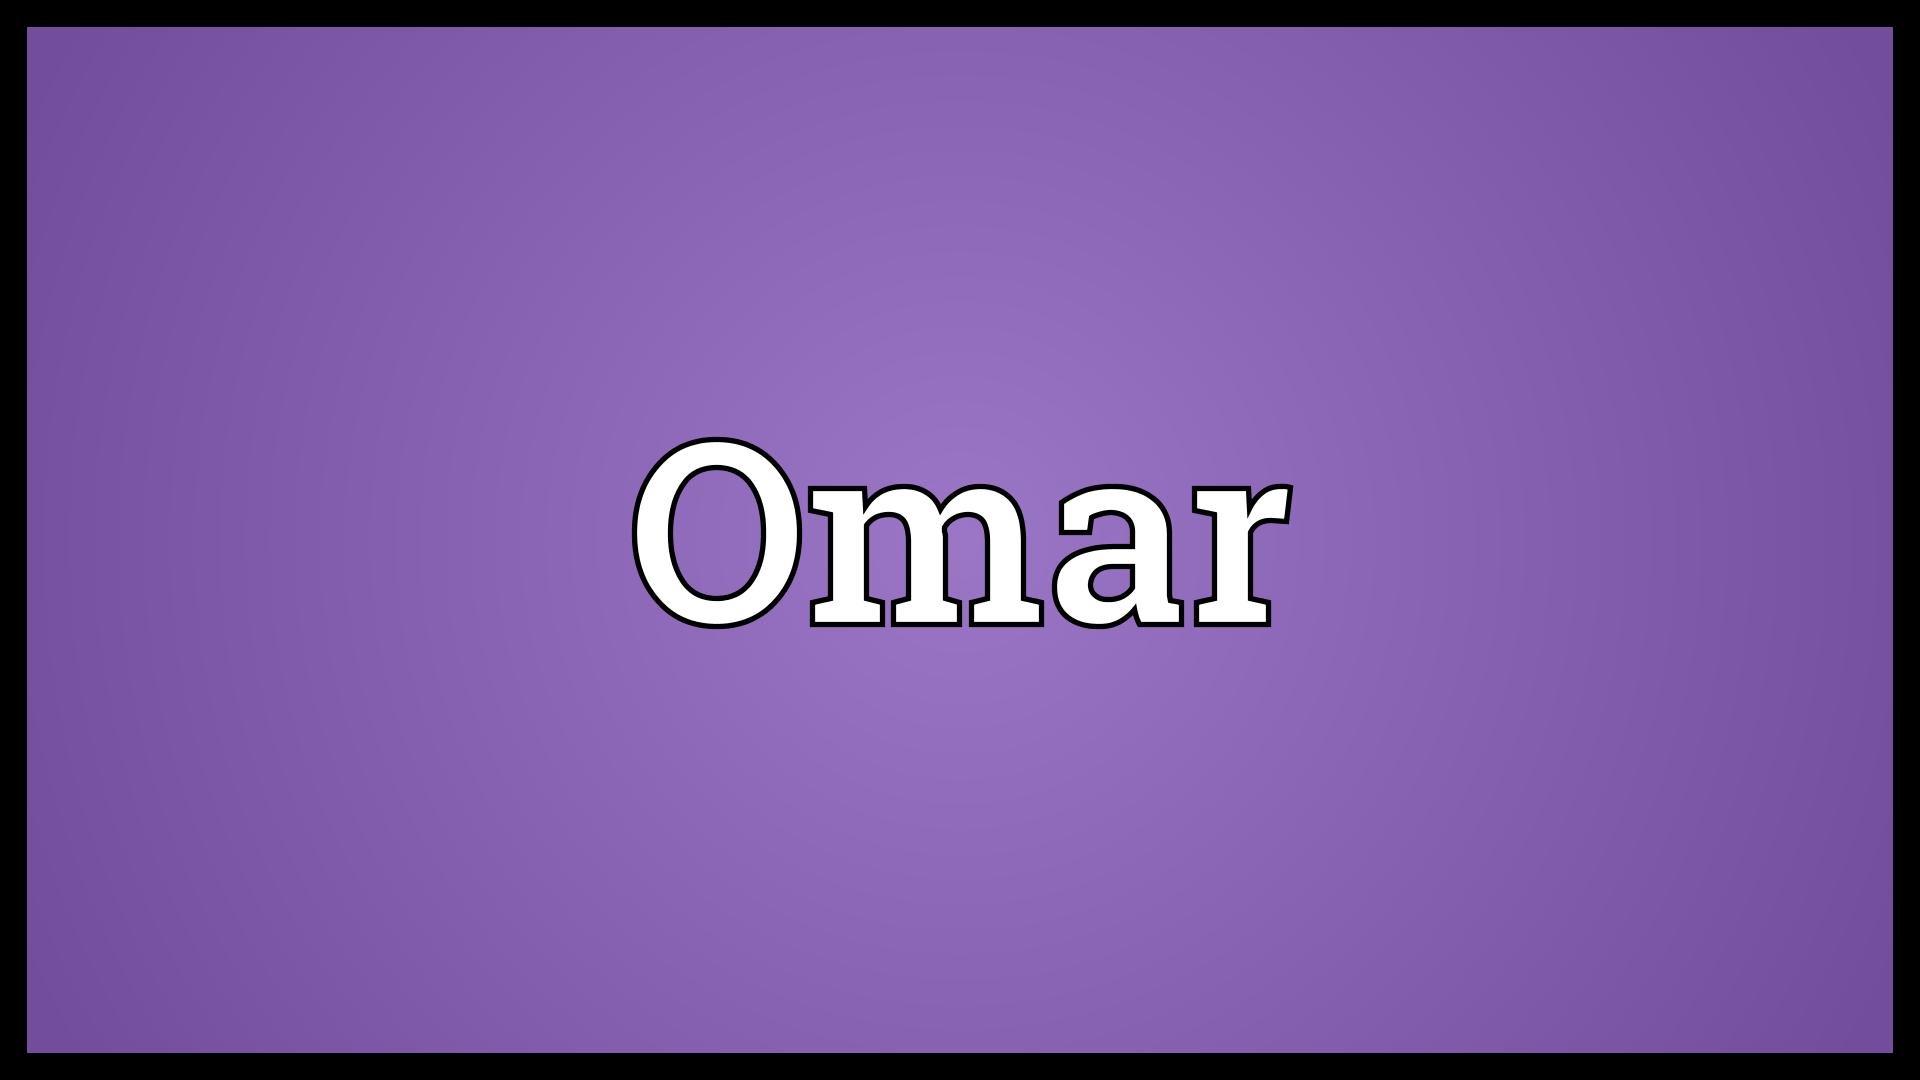 صوره صور اسم عمر , اروع صور لاسم عمر